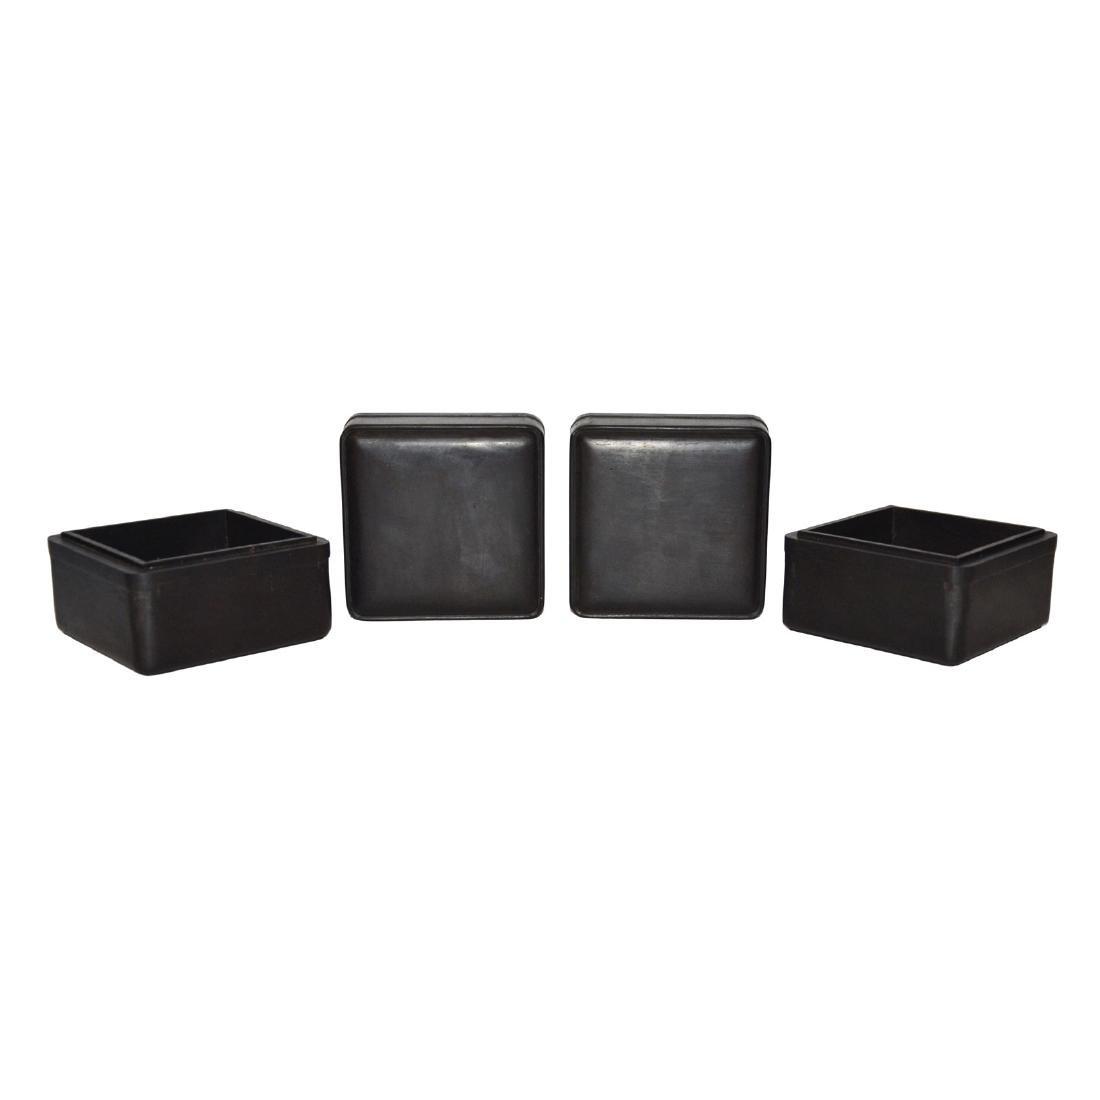 Qing, A Pair of Small Zitan Square Box - 3